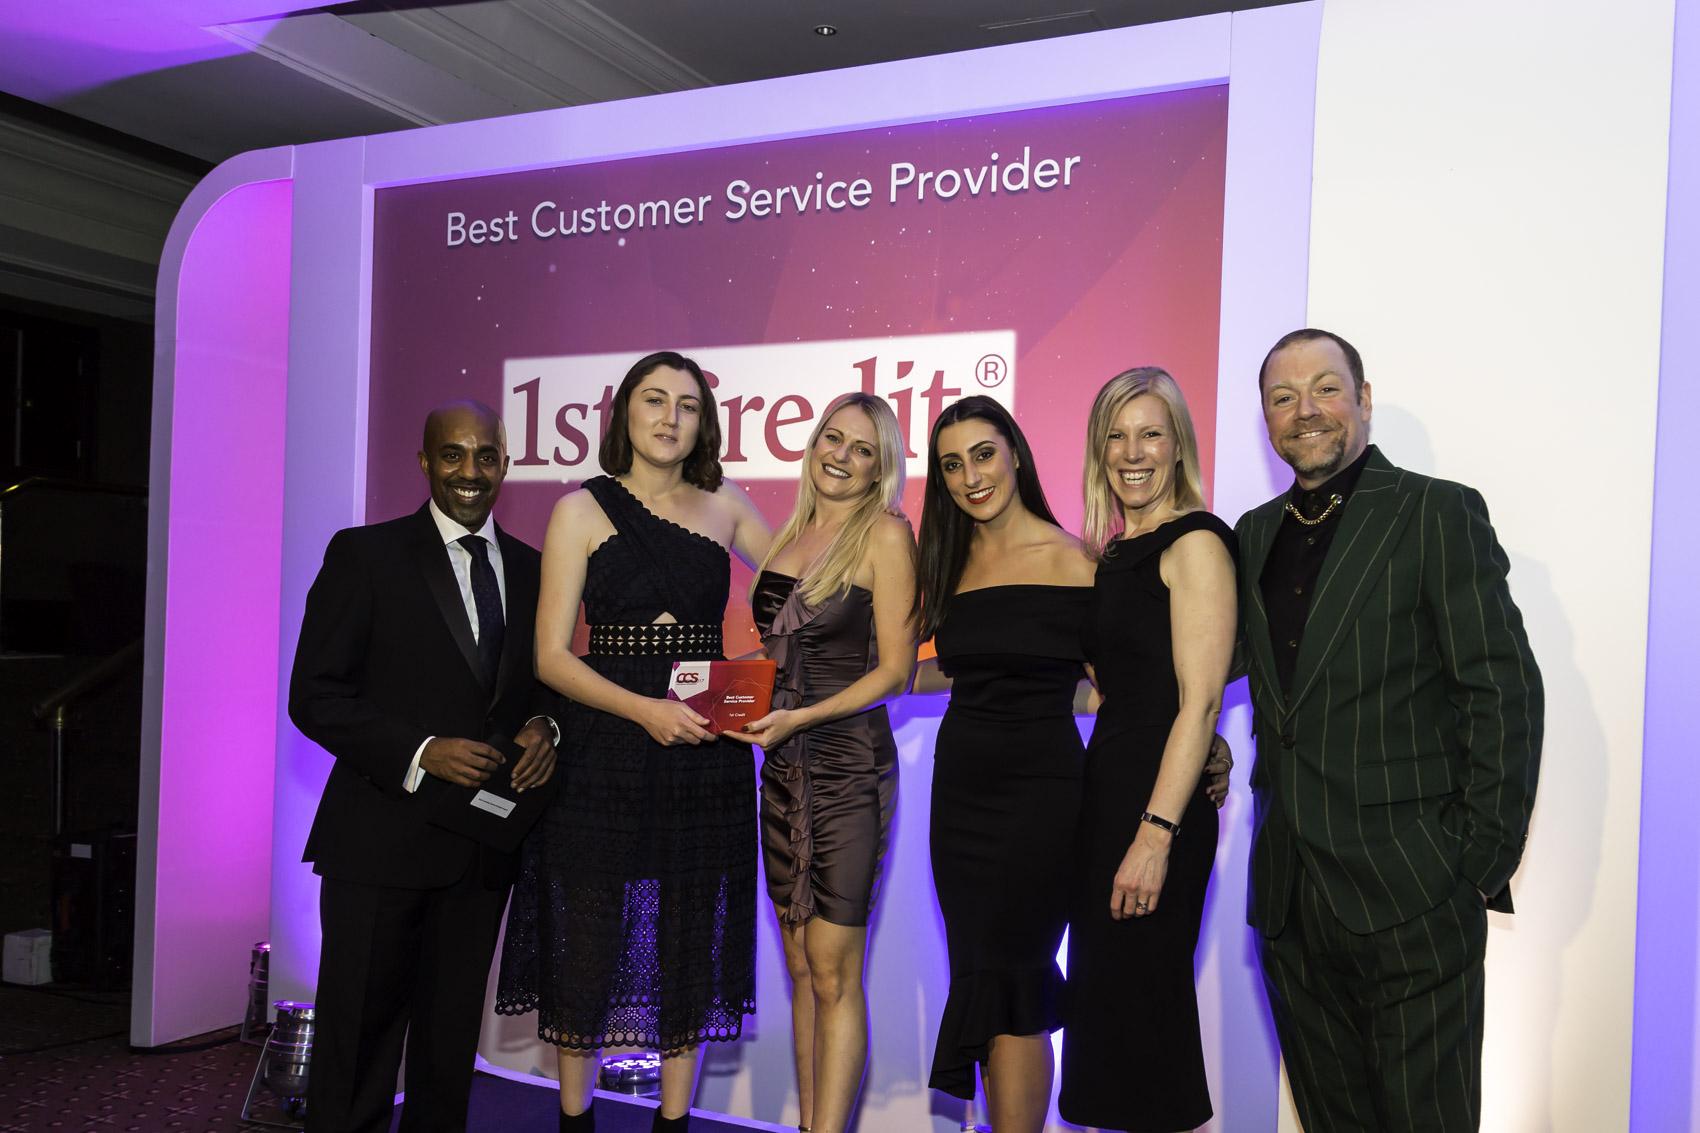 Winners CCS 2017 - 10 Best Customer Service Provider